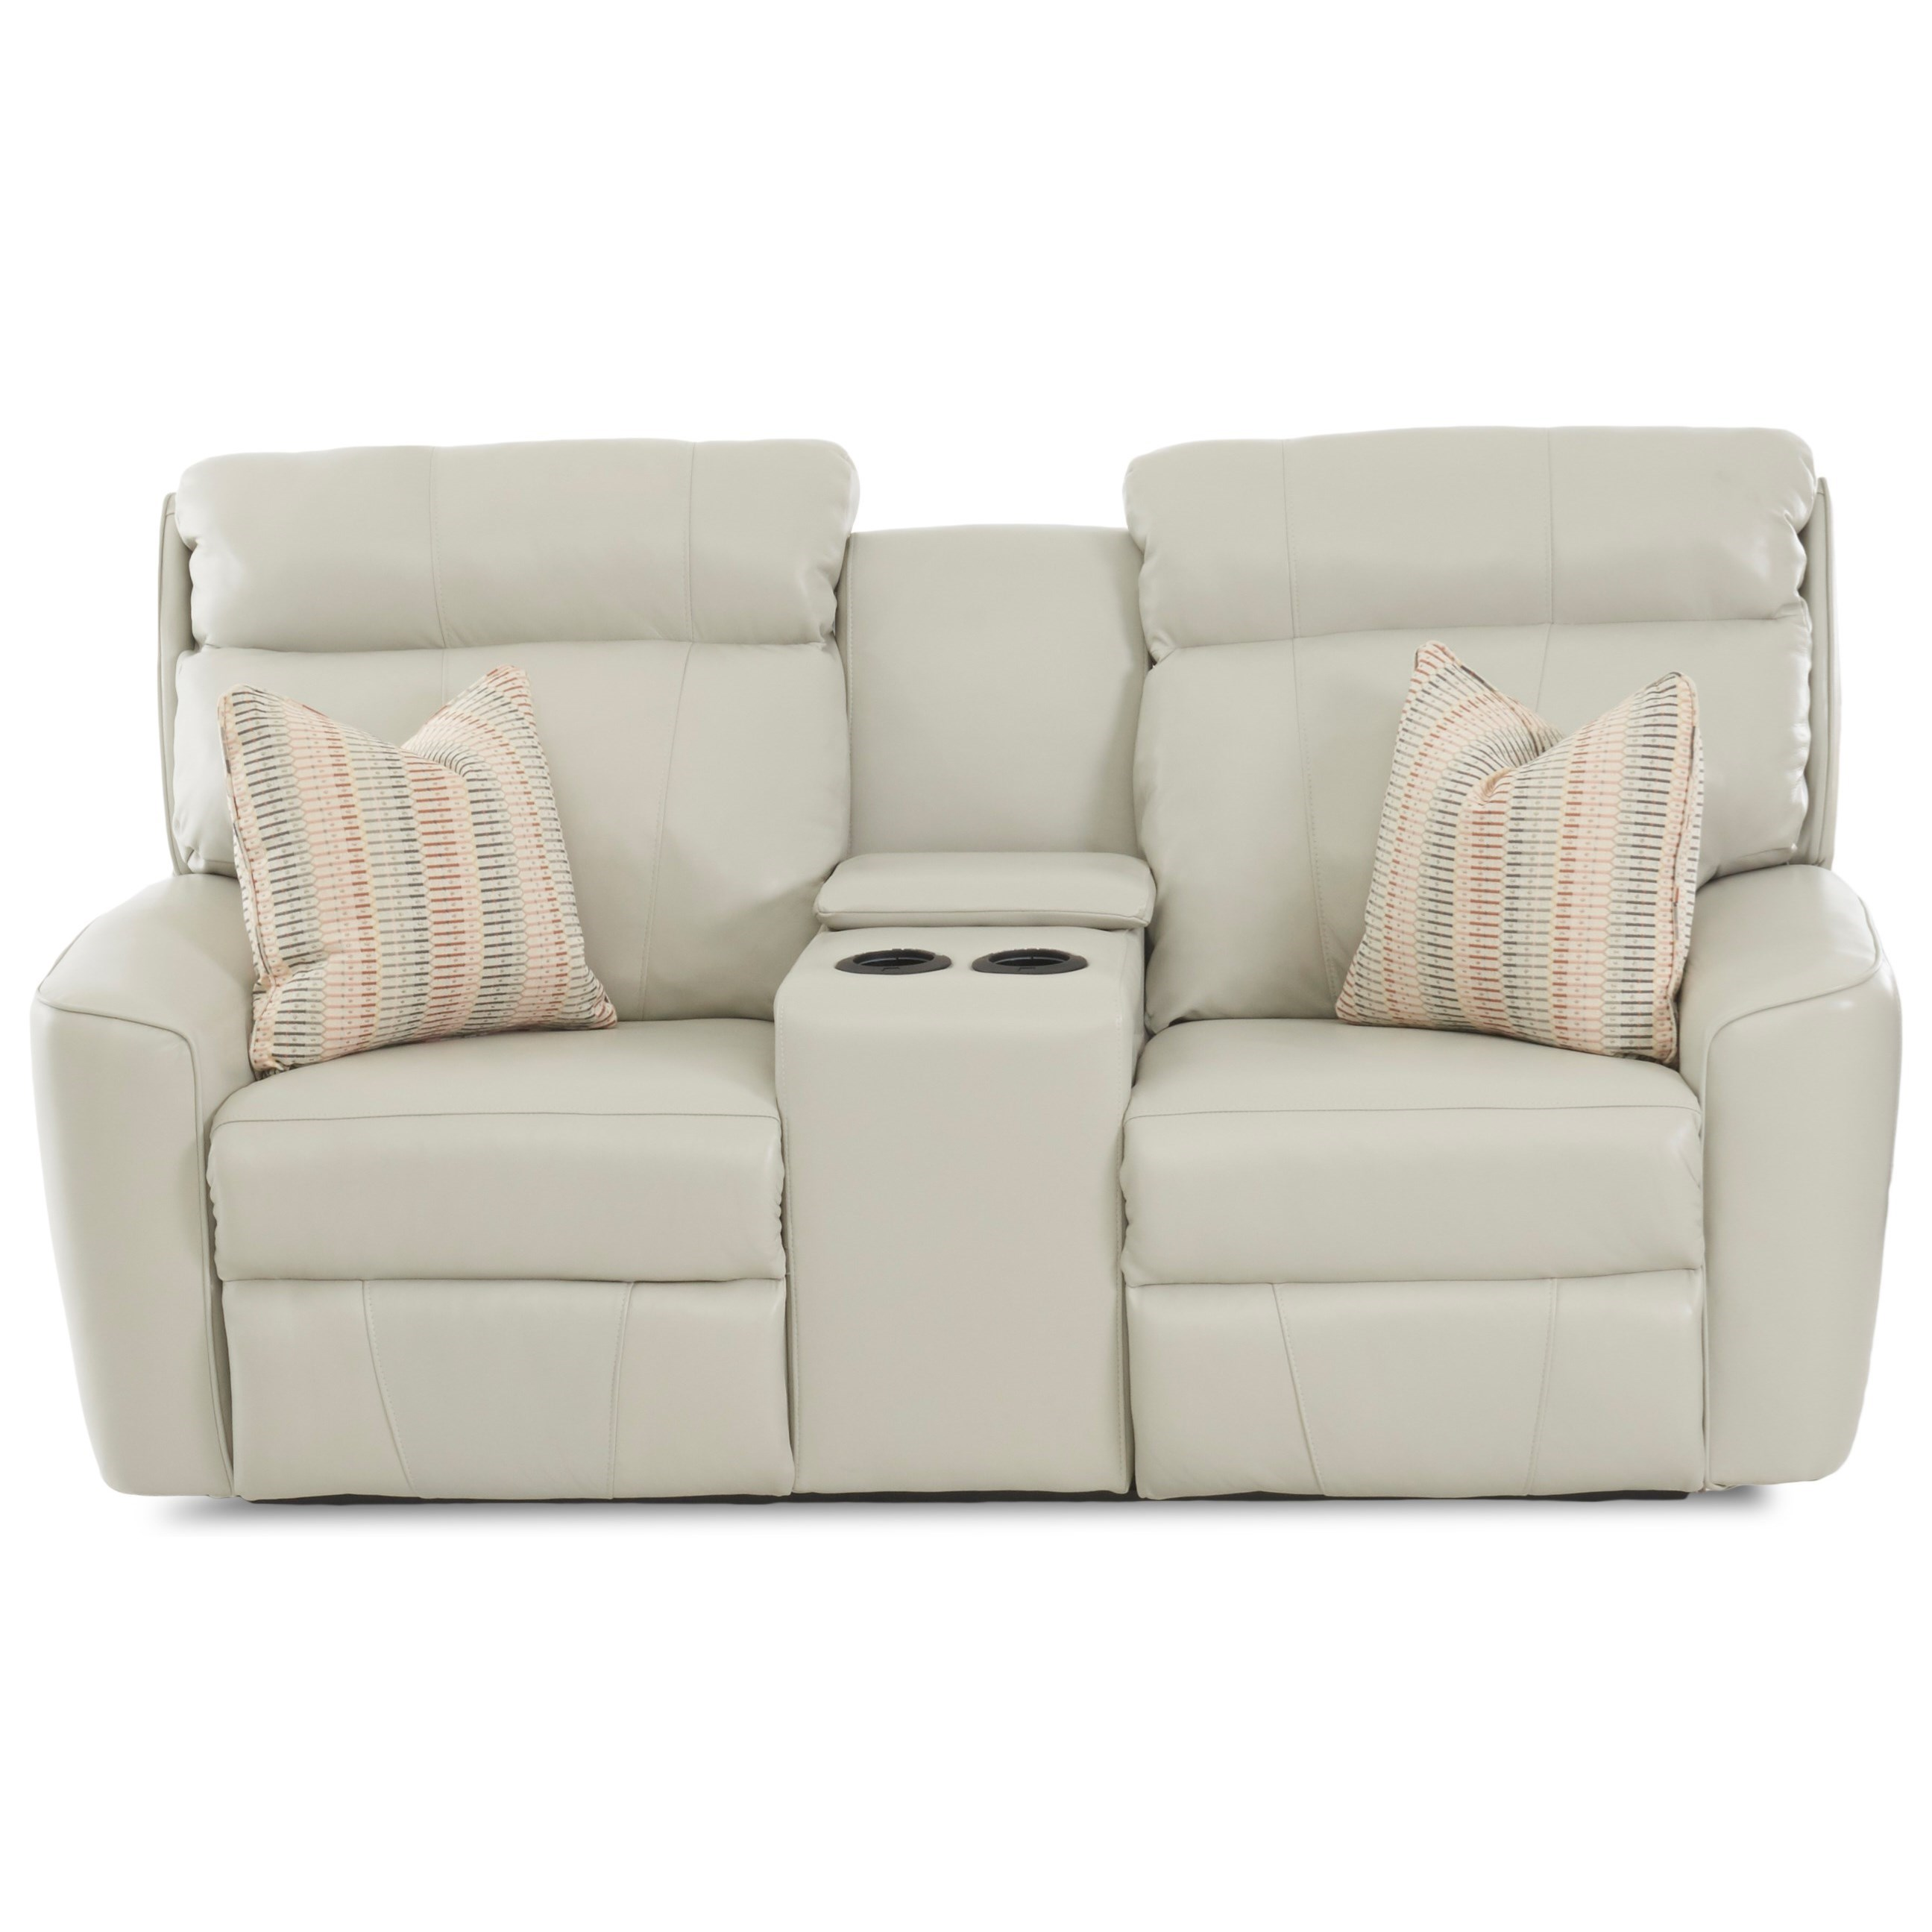 Elara PwrRecl LS w/console w/ head/Lumb w/ Pillows by Klaussner at Lapeer Furniture & Mattress Center